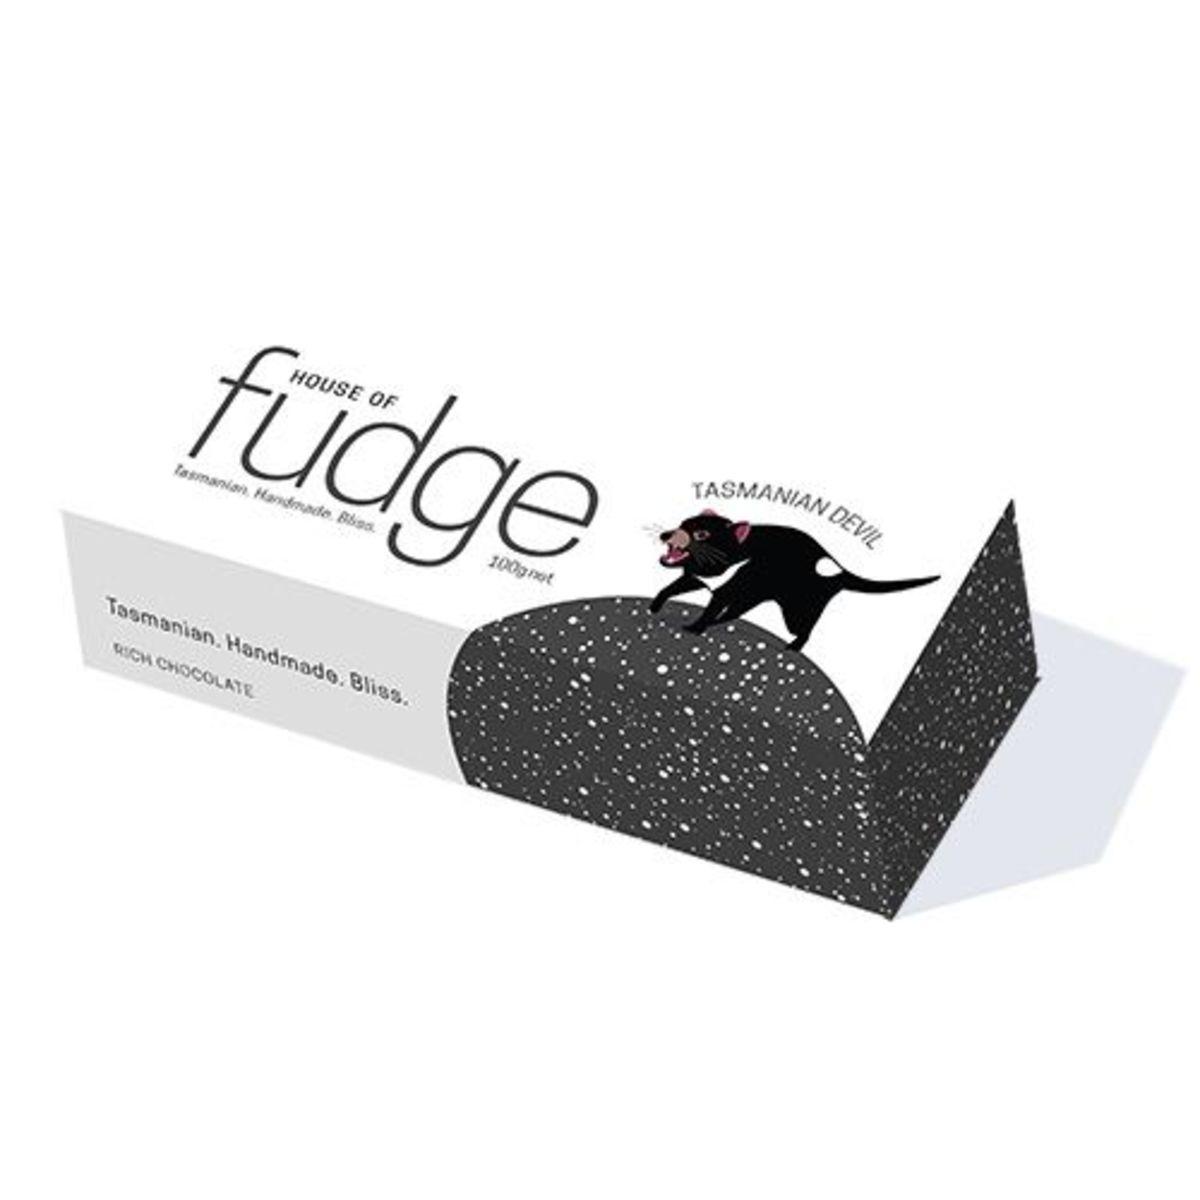 House of Fudge - Tasmanian Devil - Rich Chocolate